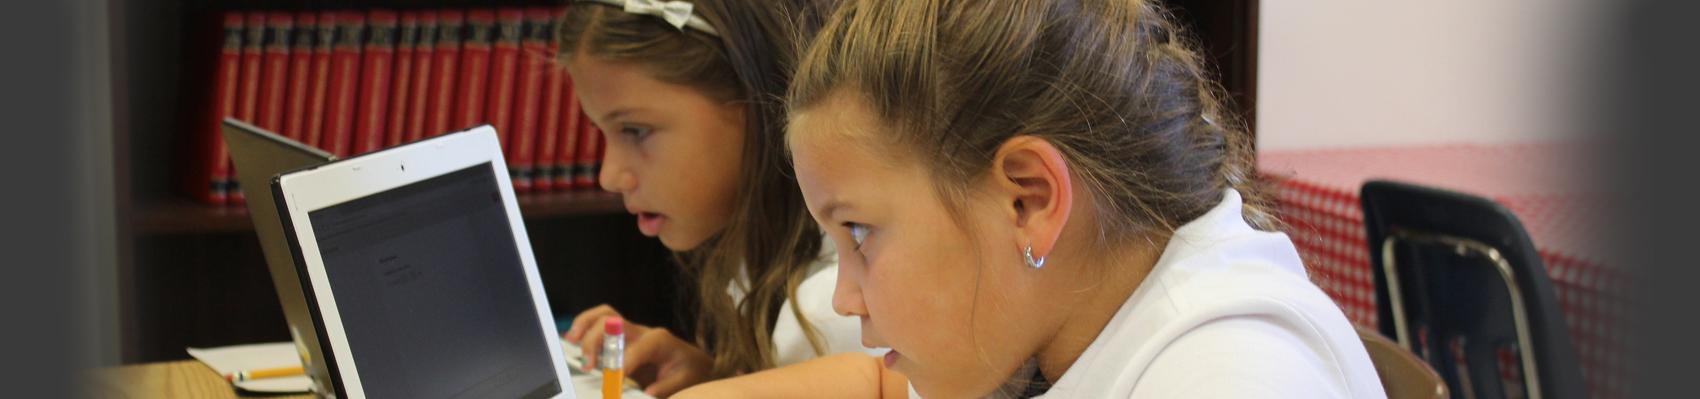 Student doing classwork on computer